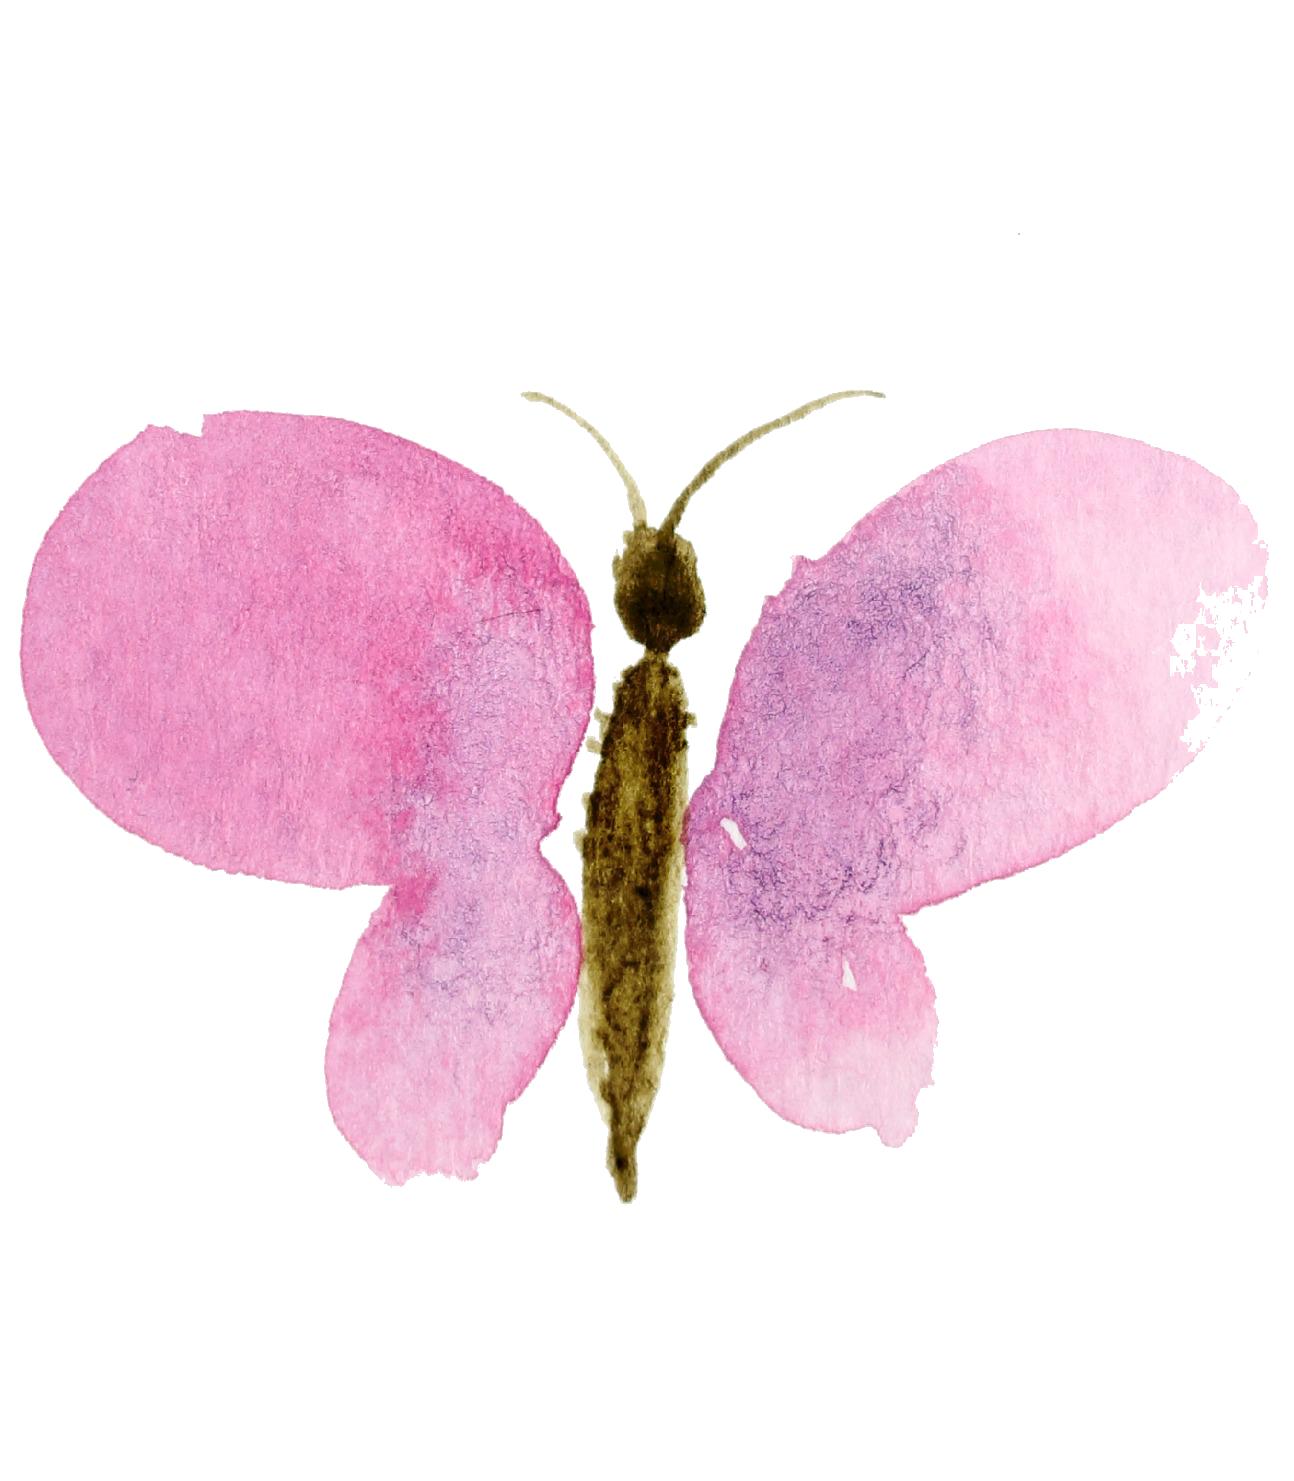 Watercolor clipart png clip royalty free download Craftberry Bush: Free May Desktop Calendar and Watercolor Clipart ... clip royalty free download